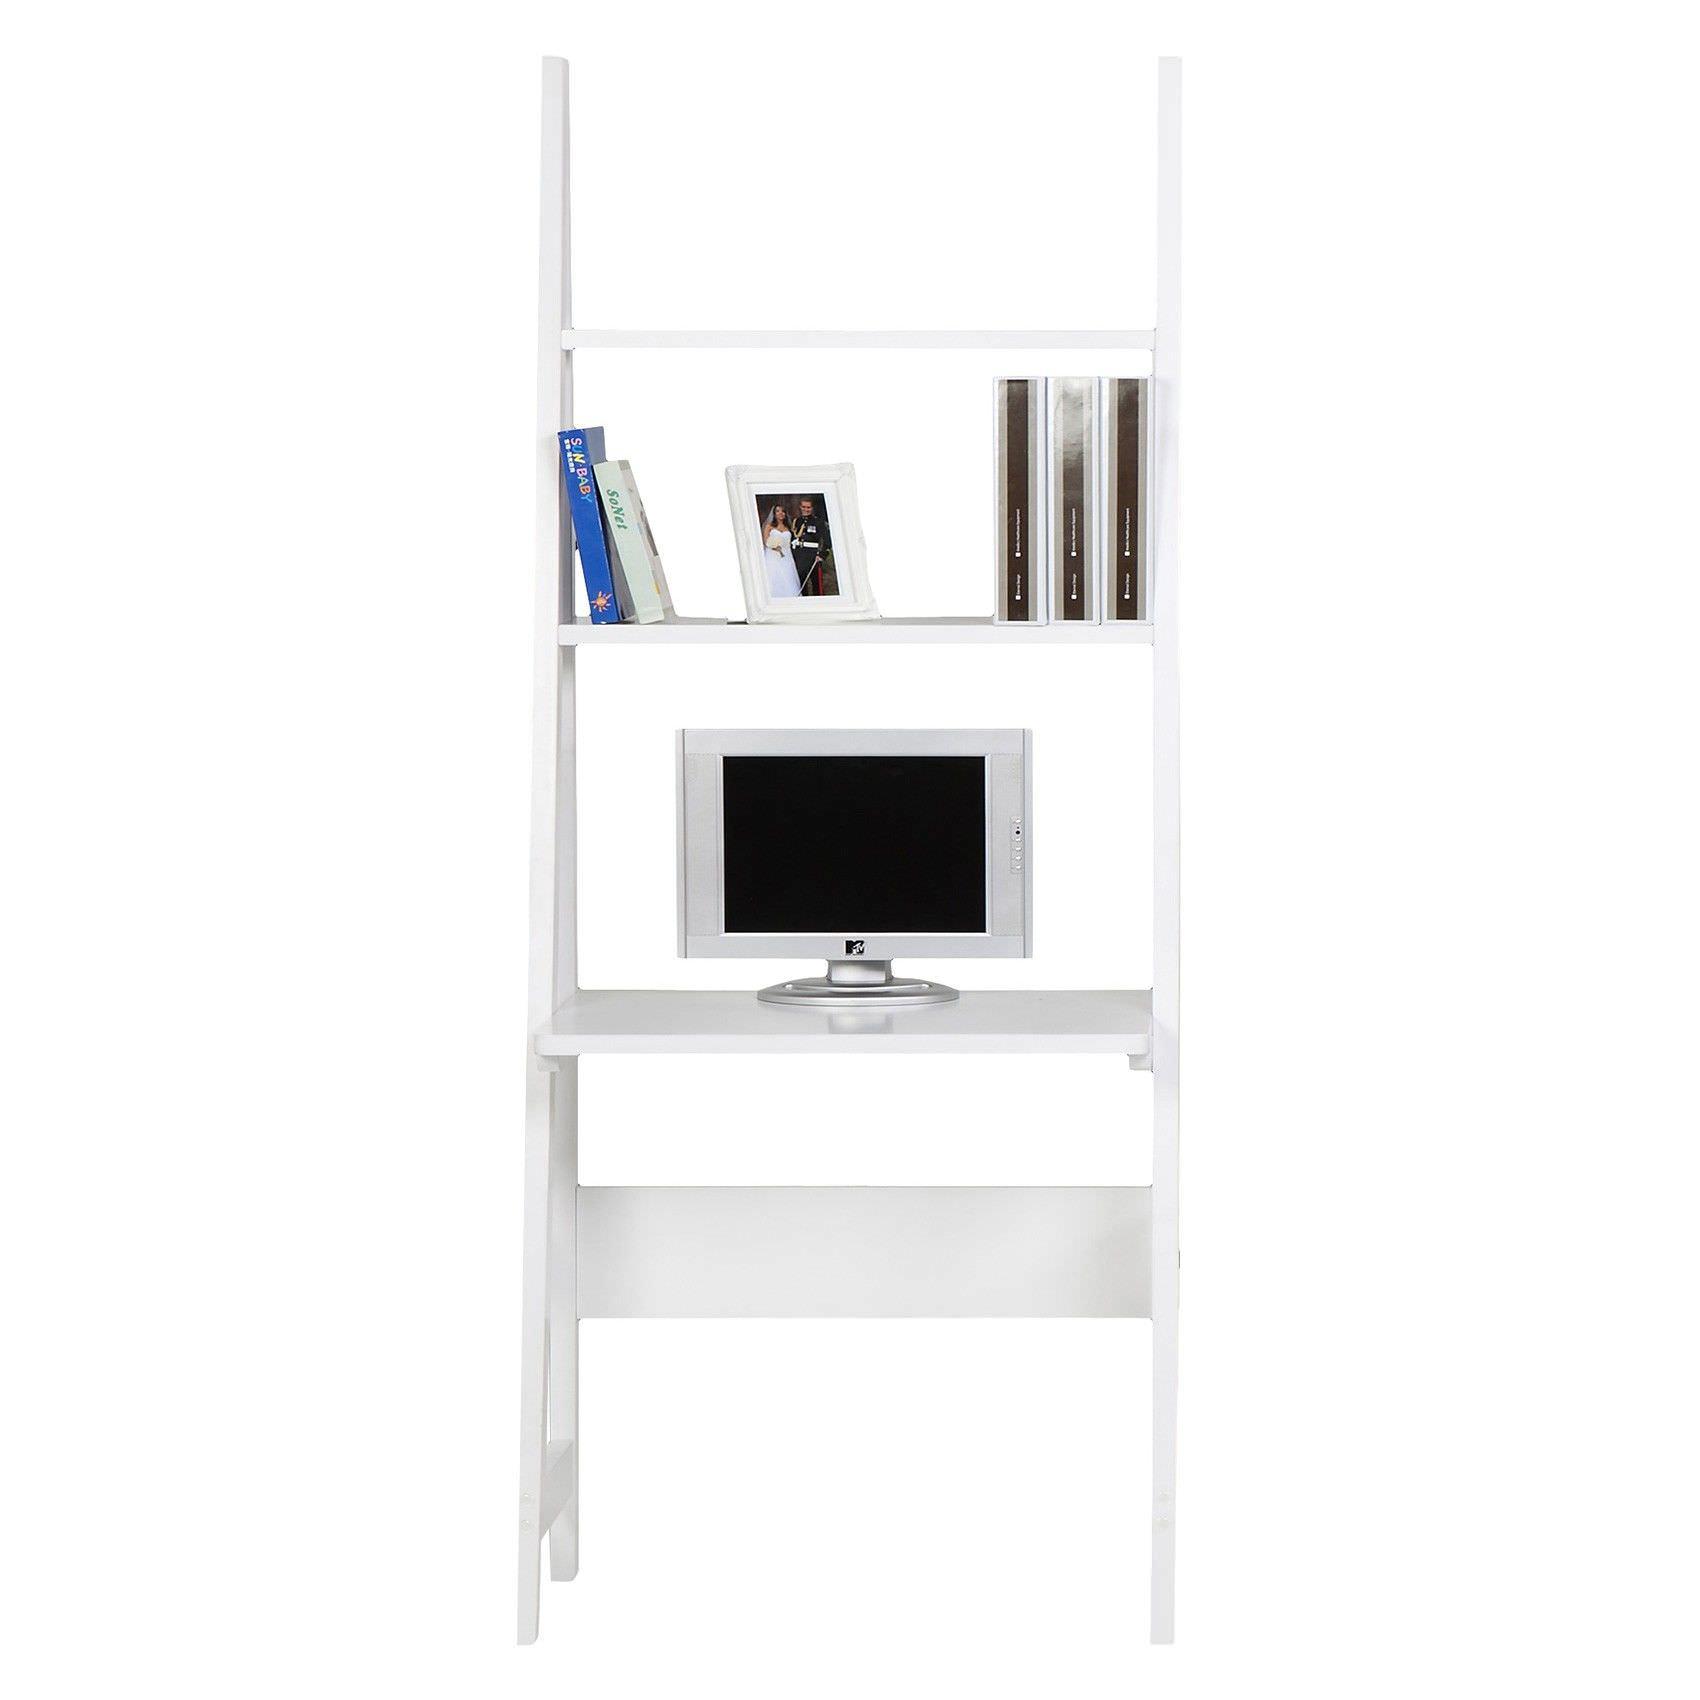 Ciarans Ladder Computer Desk with Shelf